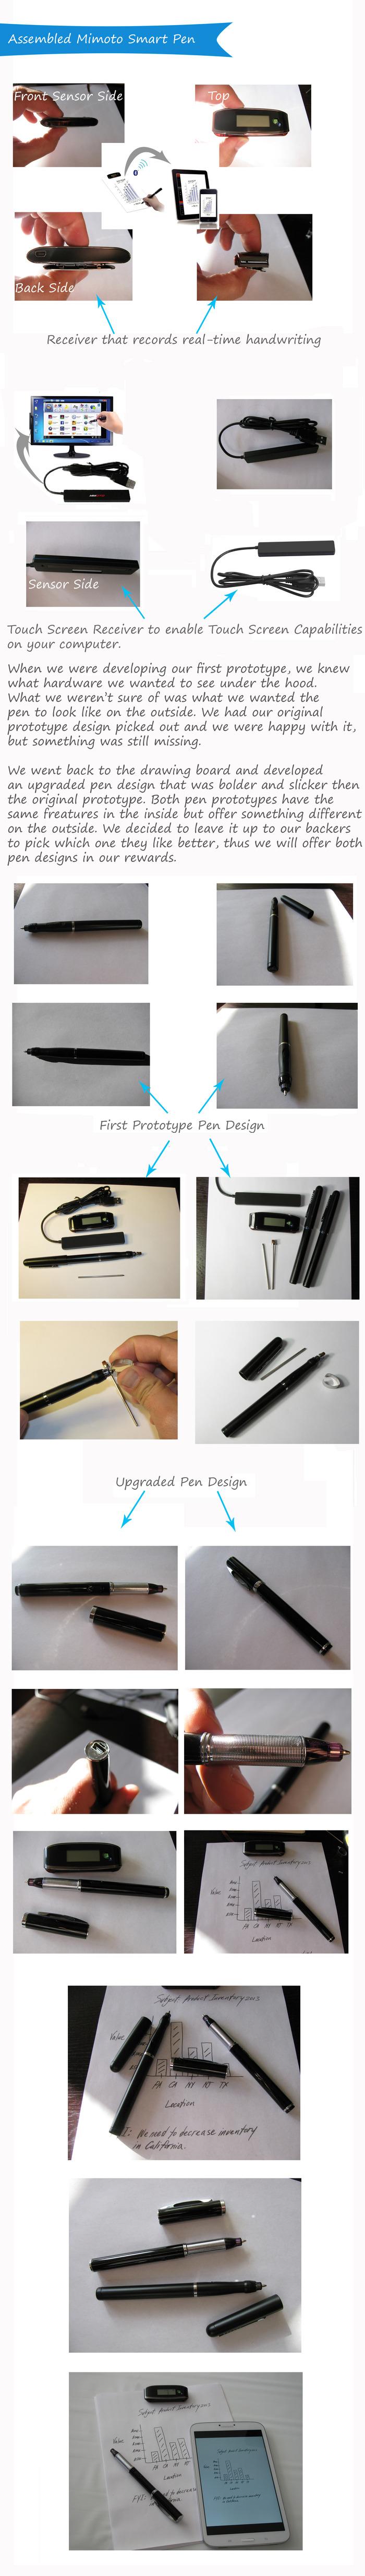 Original Design vs Upgraded